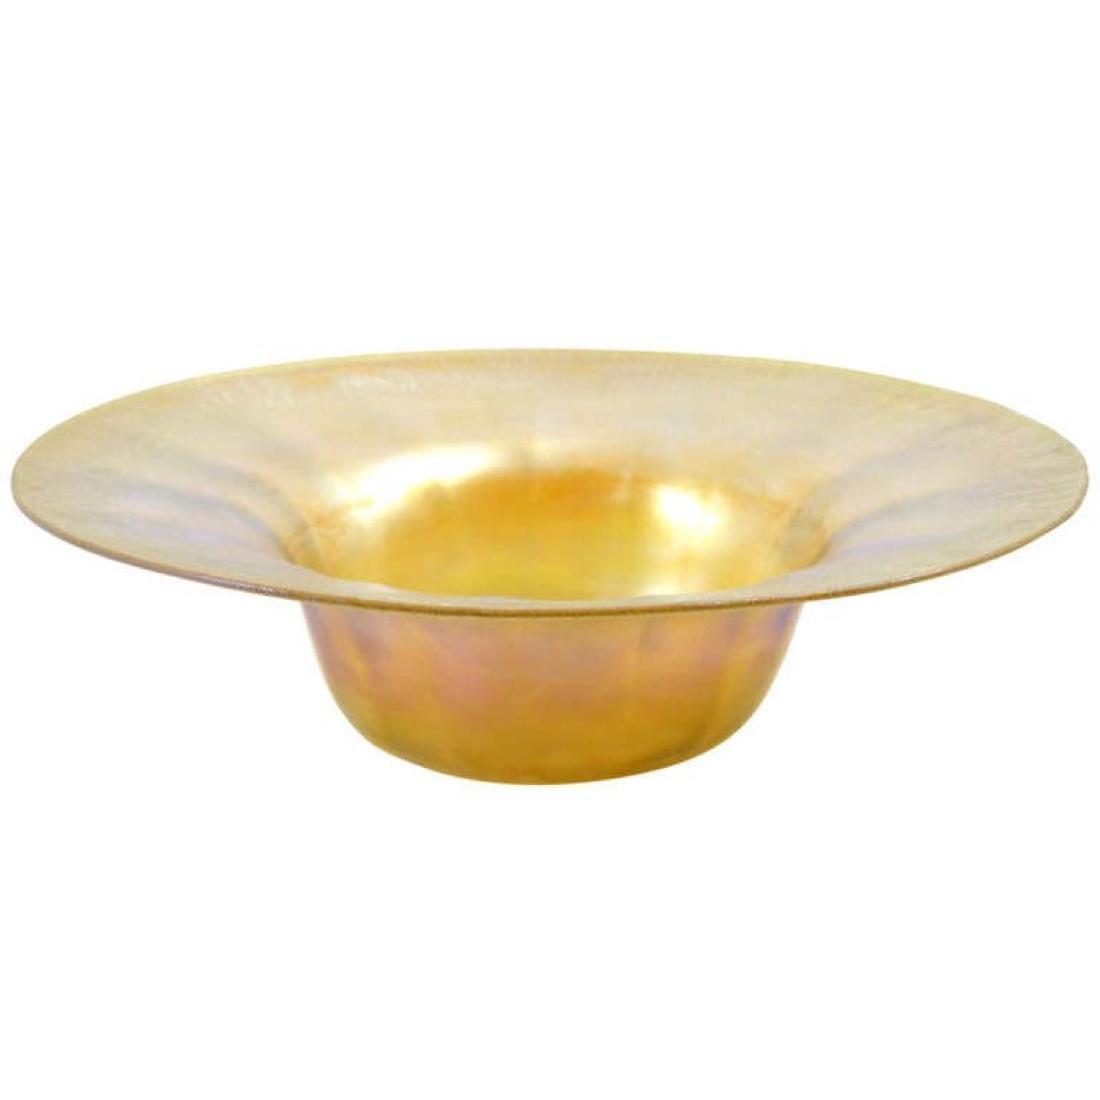 Tiffany Favrile Glass Bowl